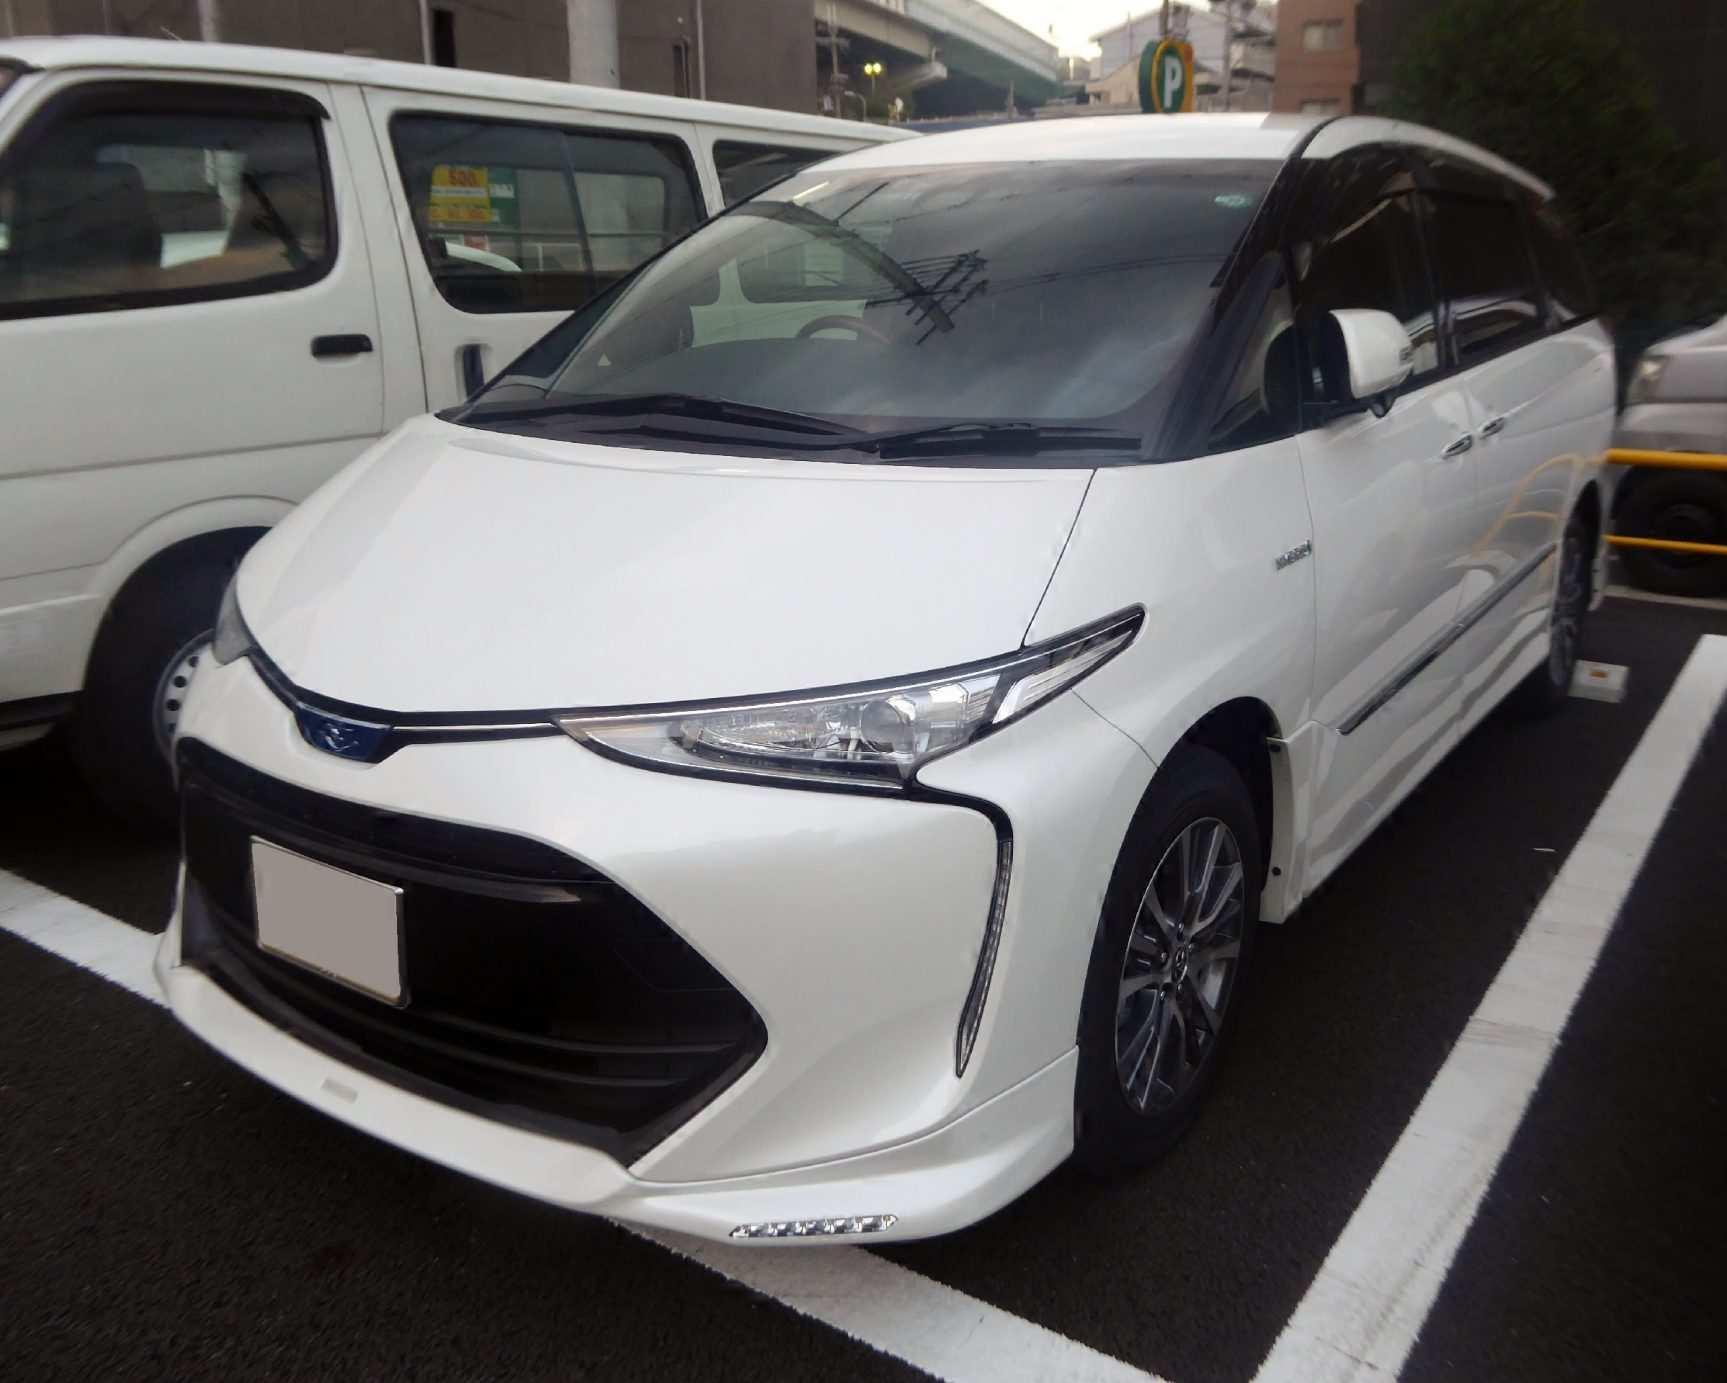 96 Concept of Toyota Estima 2019 Release Date with Toyota Estima 2019